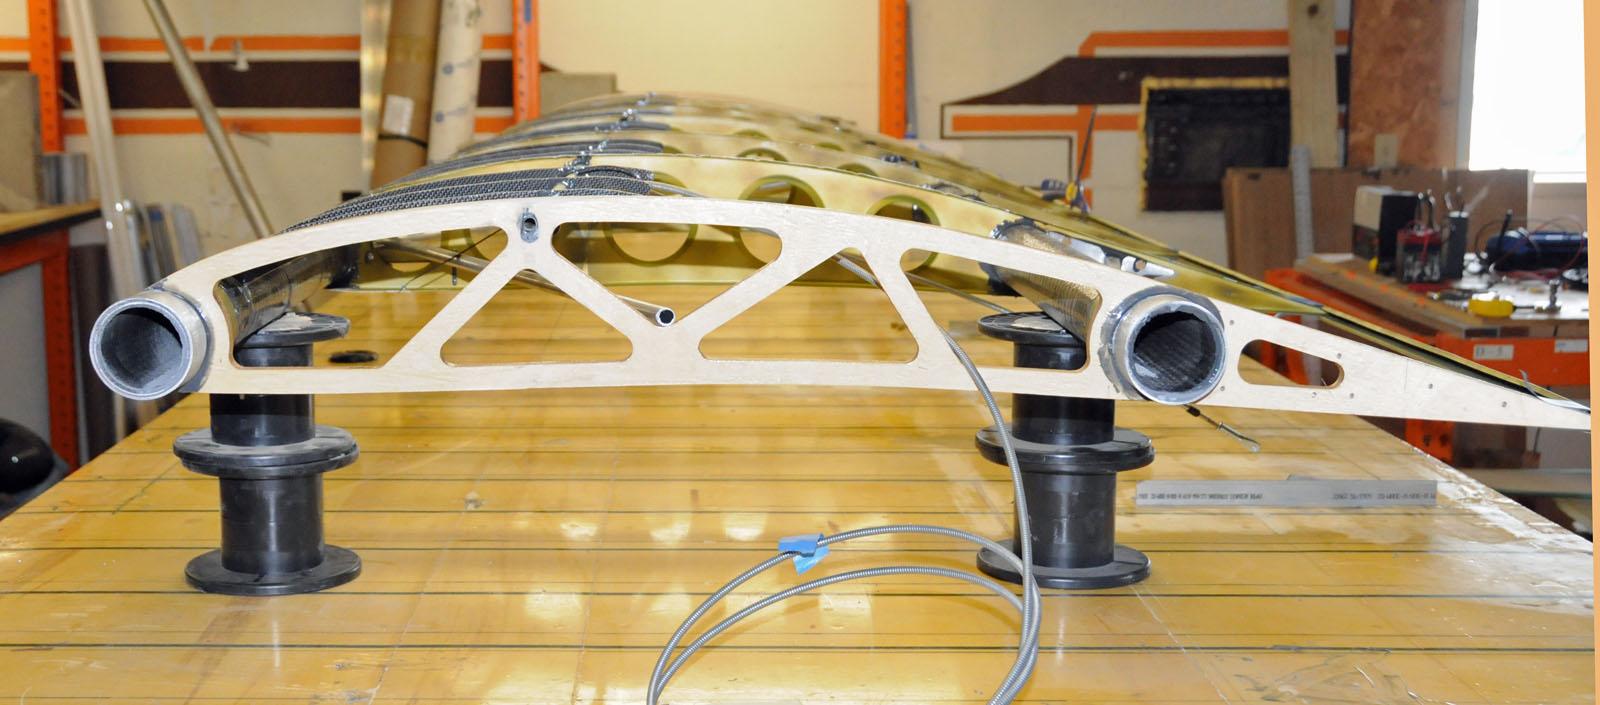 Belite Ultralight Blog Building A Carbon Fiber Wing With